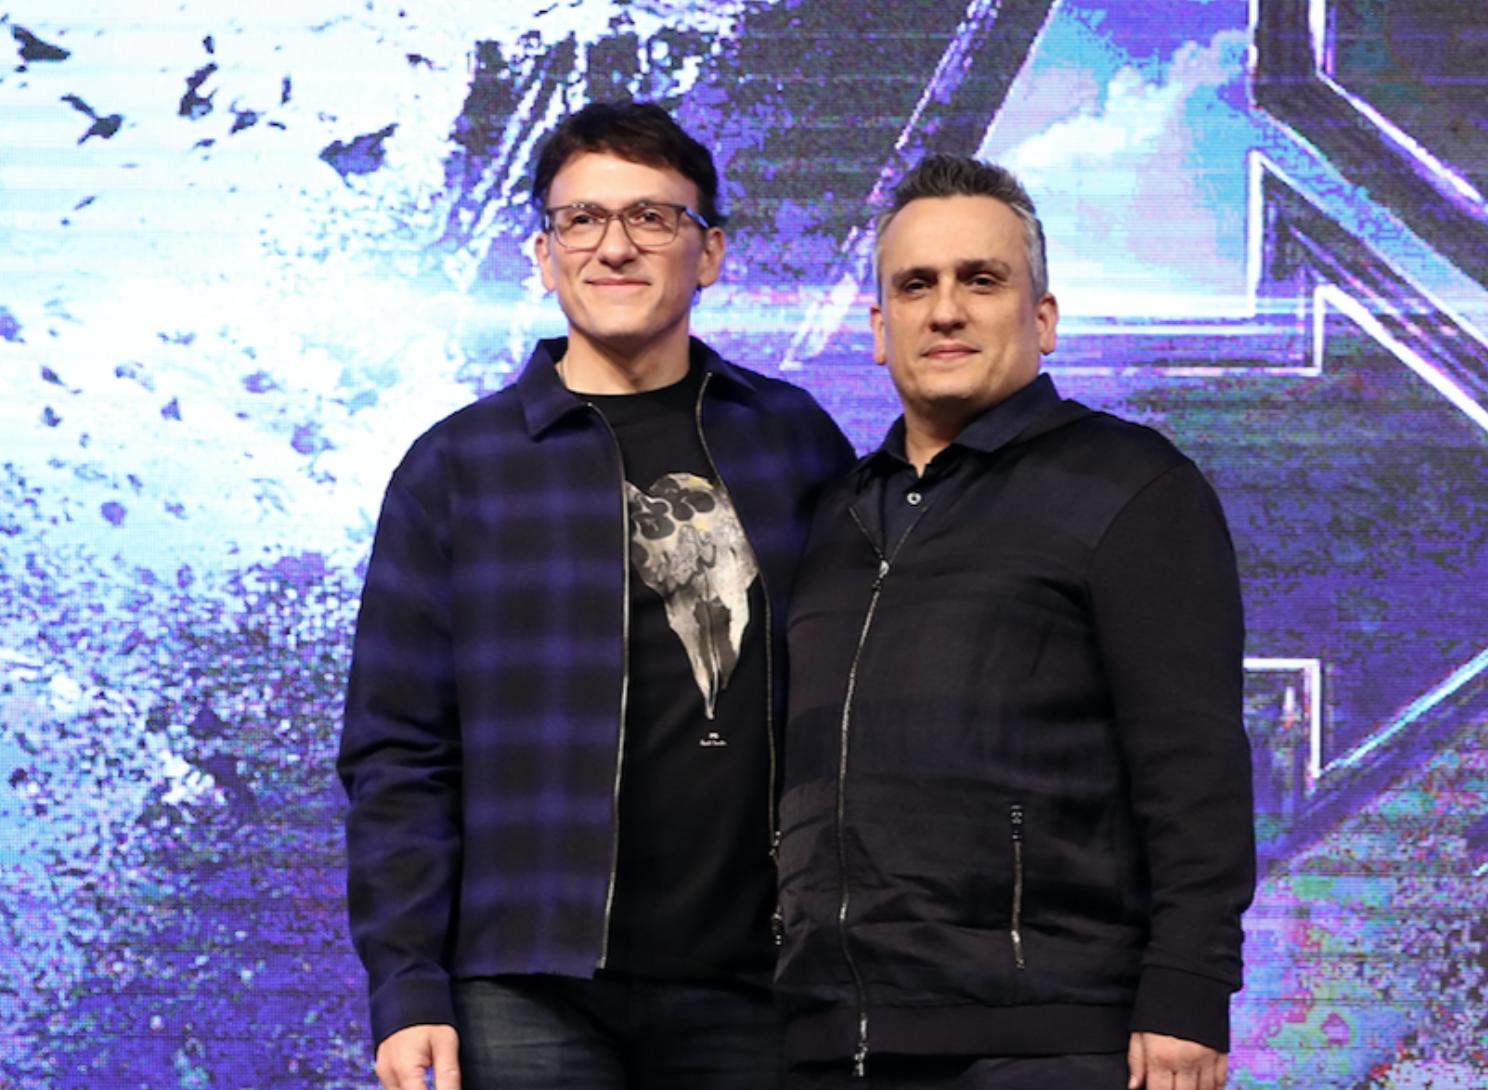 'Avengers: Endgame' Directors Ask Fans to Not 'Spoil' Movie